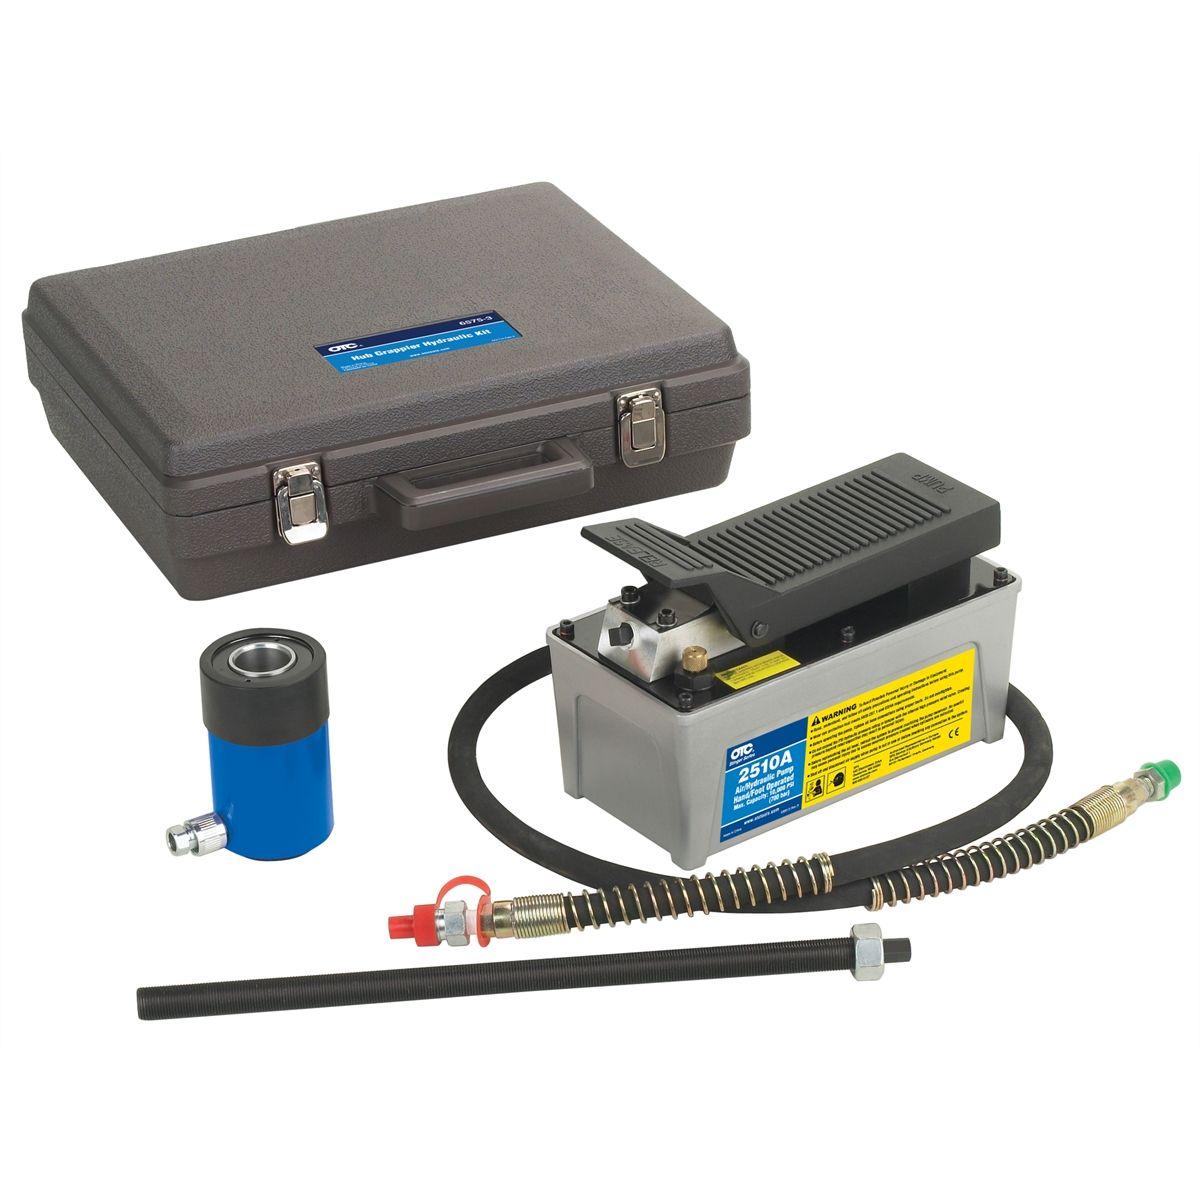 hub grappler hydraulic tool kit otc 6575 3 rh toolsource com hub grappler application guide download Hub Grappler Manual